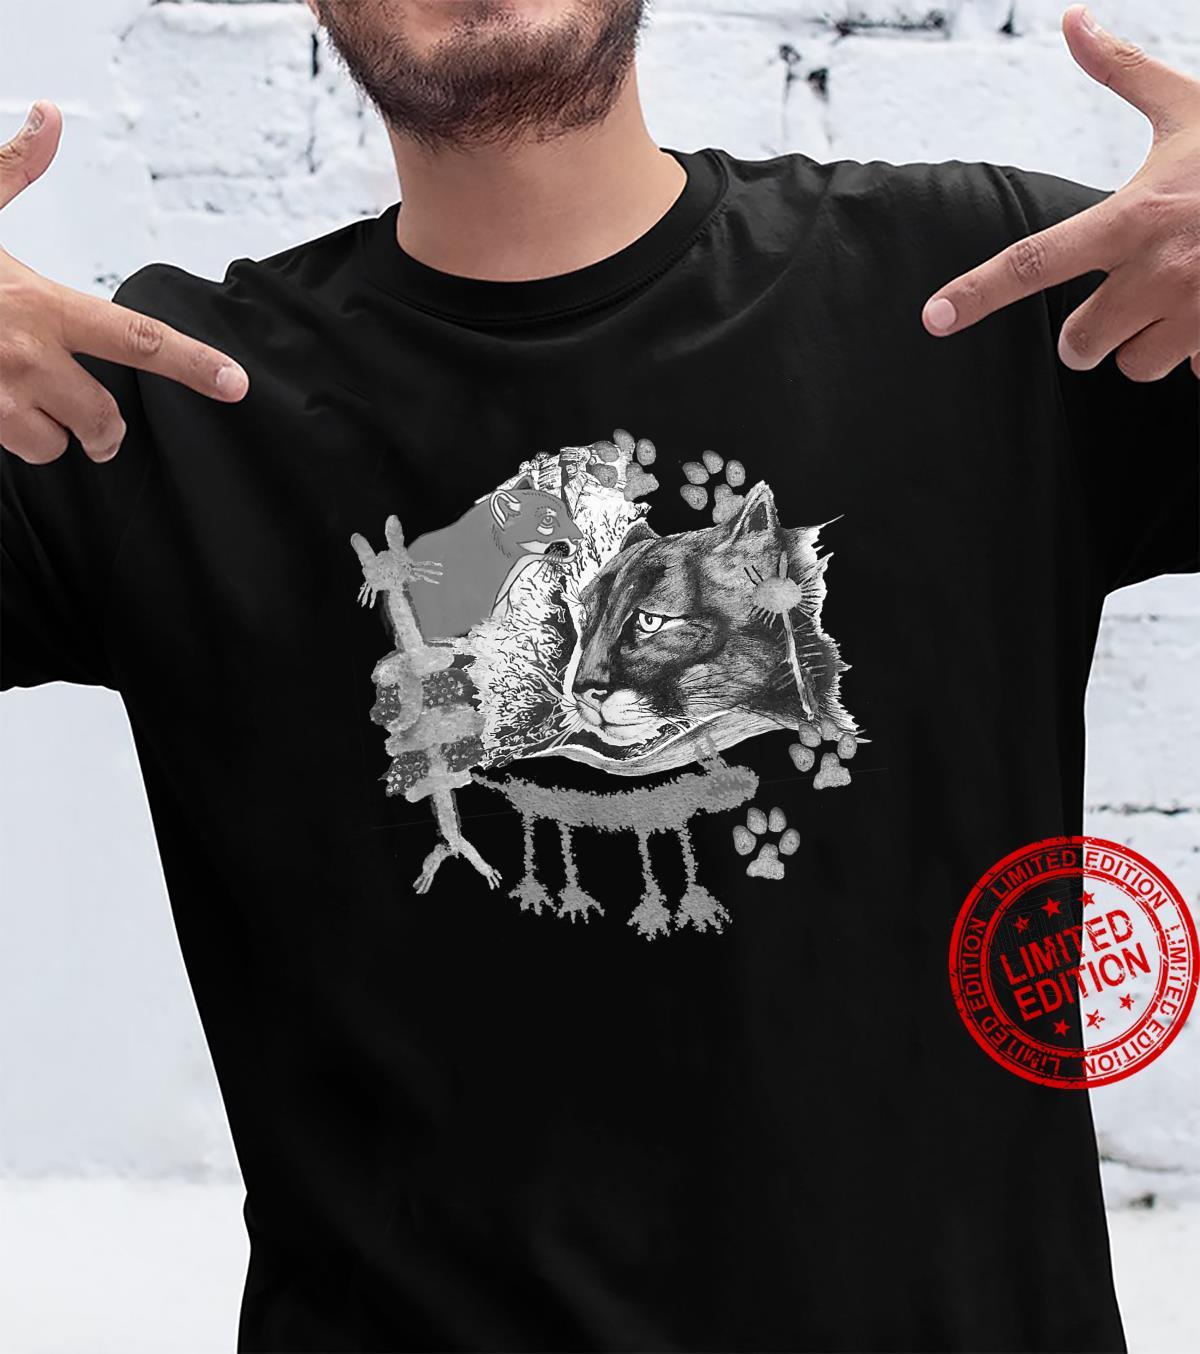 Many lions, petrographs and artwork. Shirt